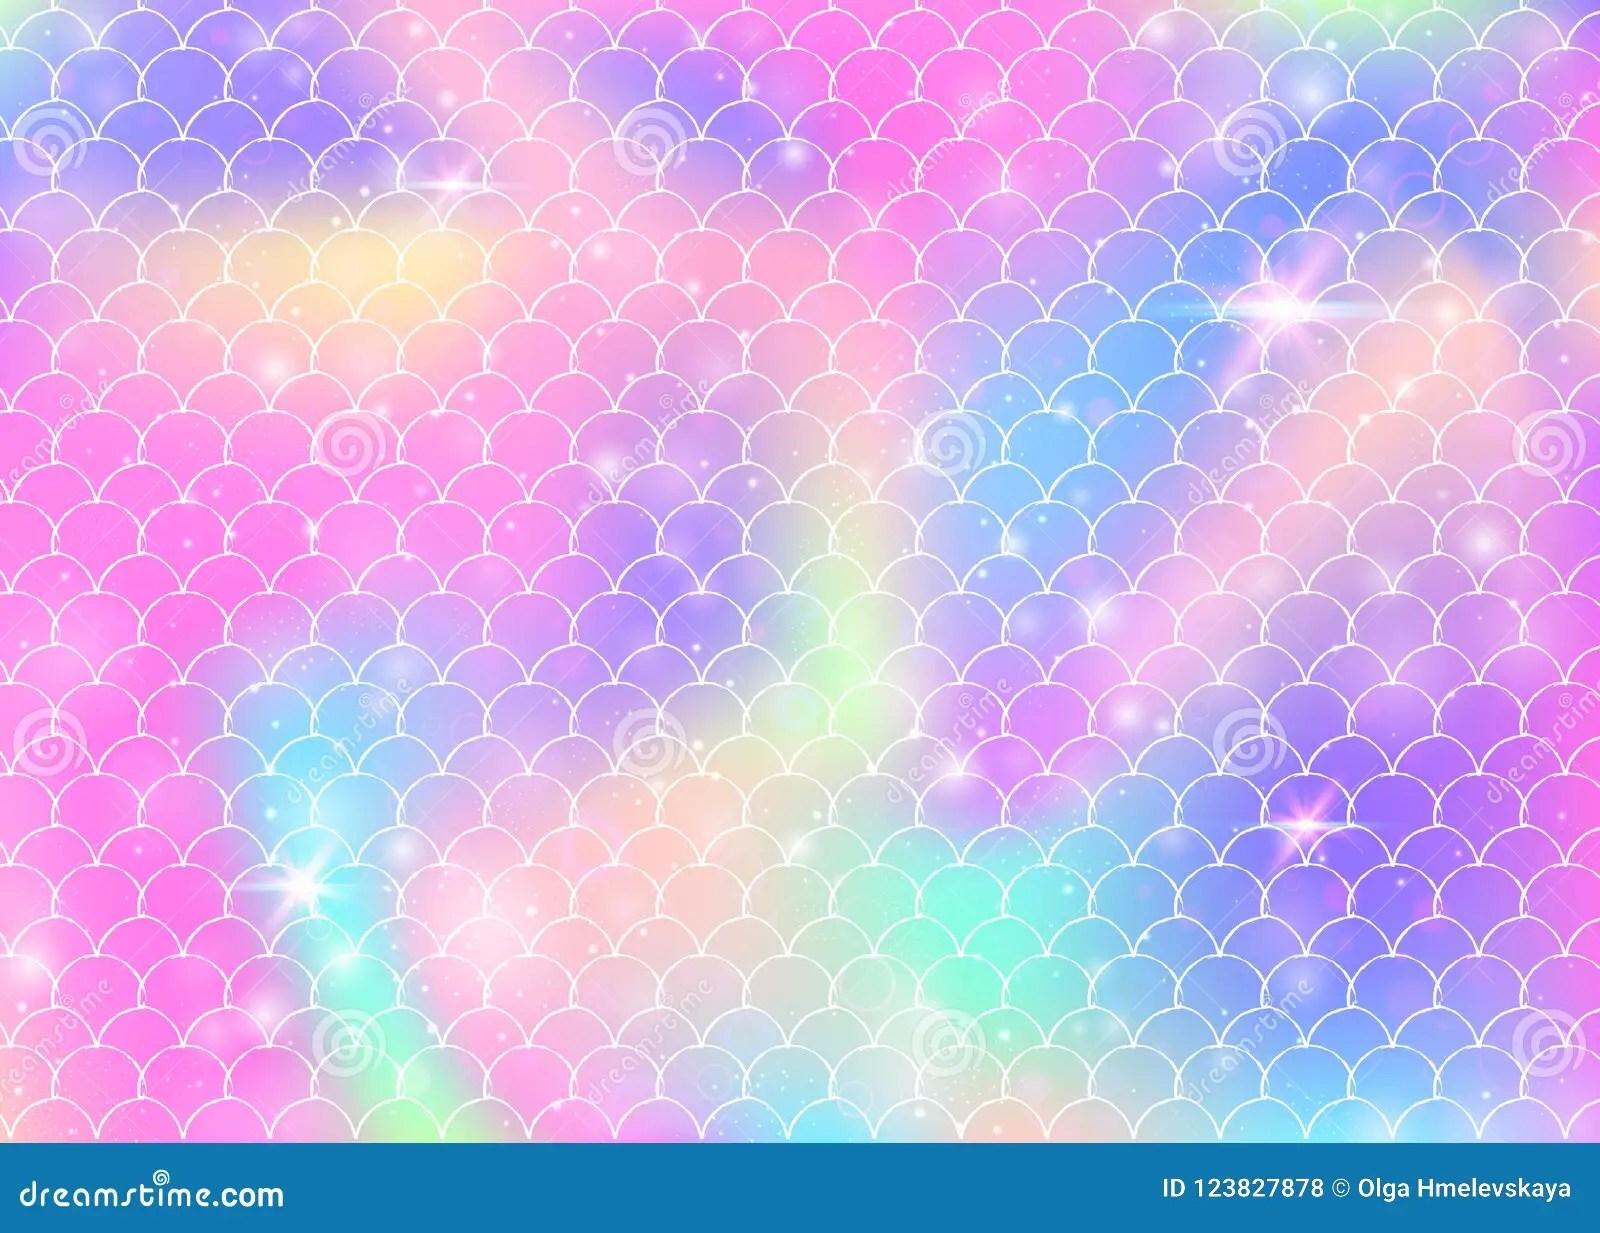 Cute Pastel Color Wallpaper Kawaii Cartoons Illustrations Amp Vector Stock Images